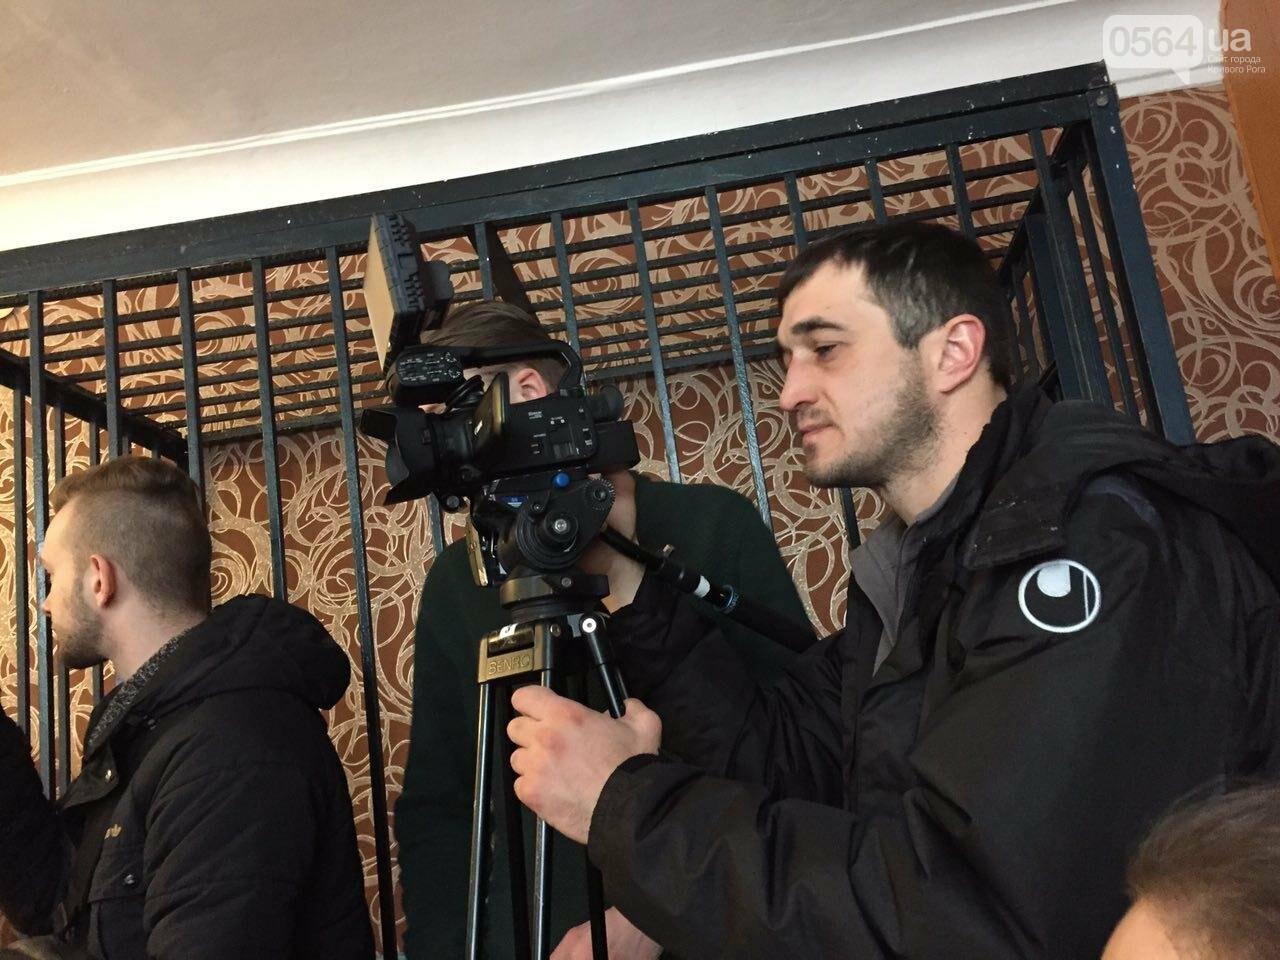 Криворожских журналистов в суде  допрашивают по делу Вячеслава Волка (ФОТО), фото-5